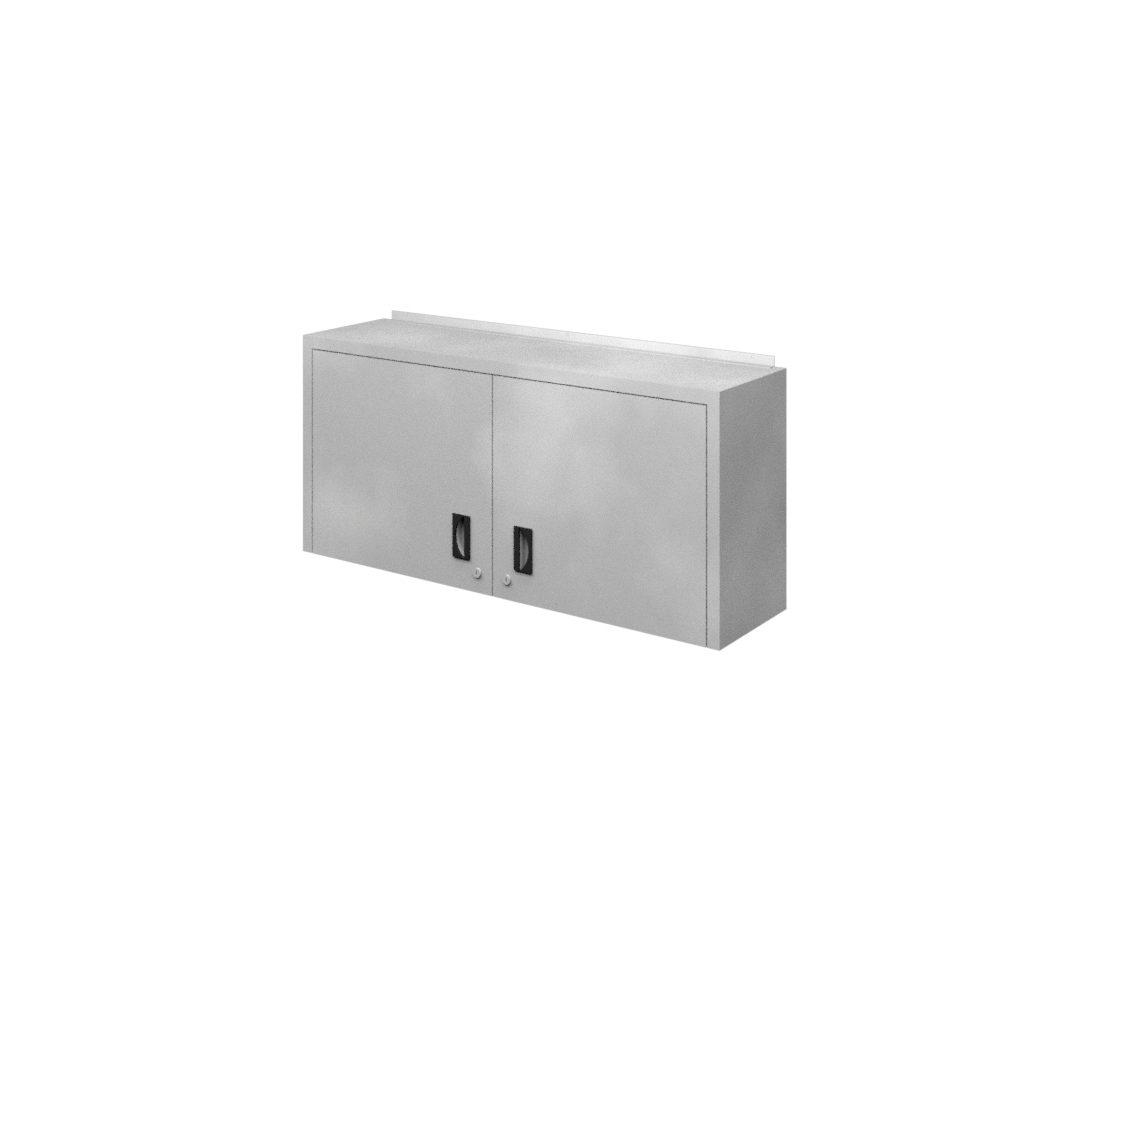 MCF_Wall Cupboard_WC1200x540